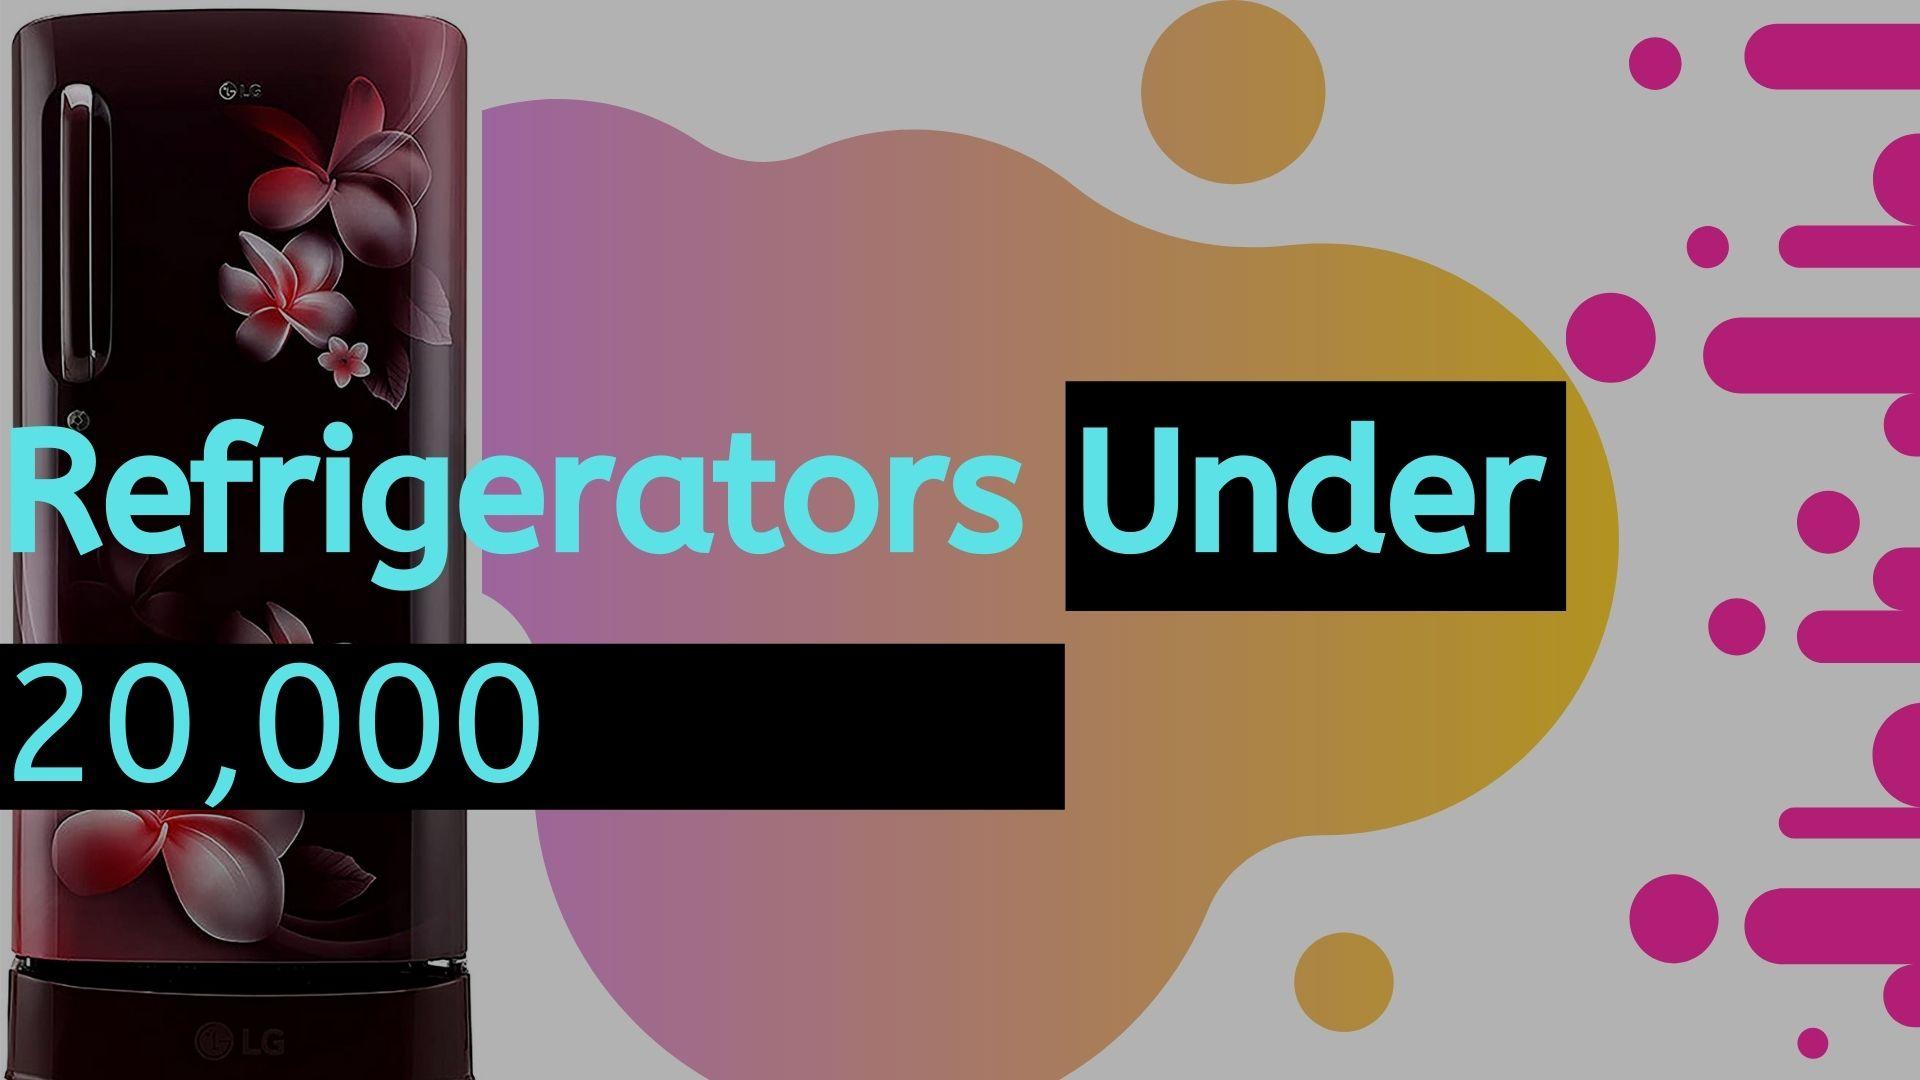 Refrigerators Under 20,000